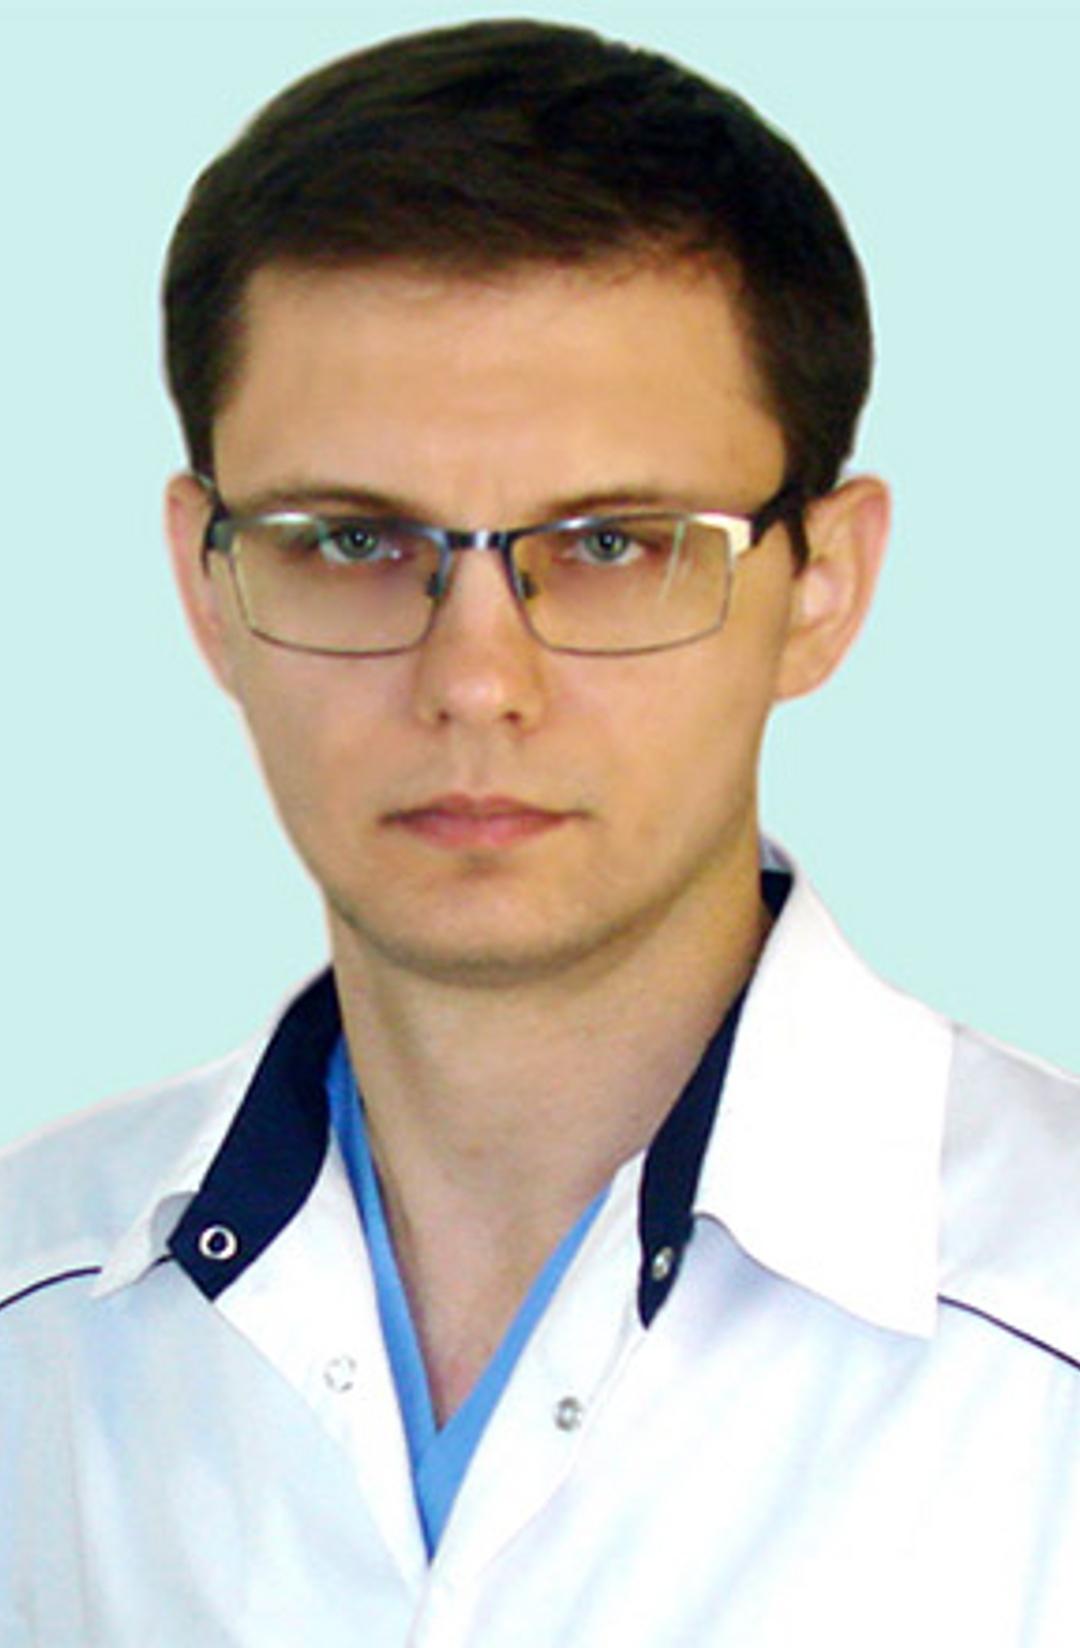 Врач хирург-флеболог Вагин Александр Владимирович